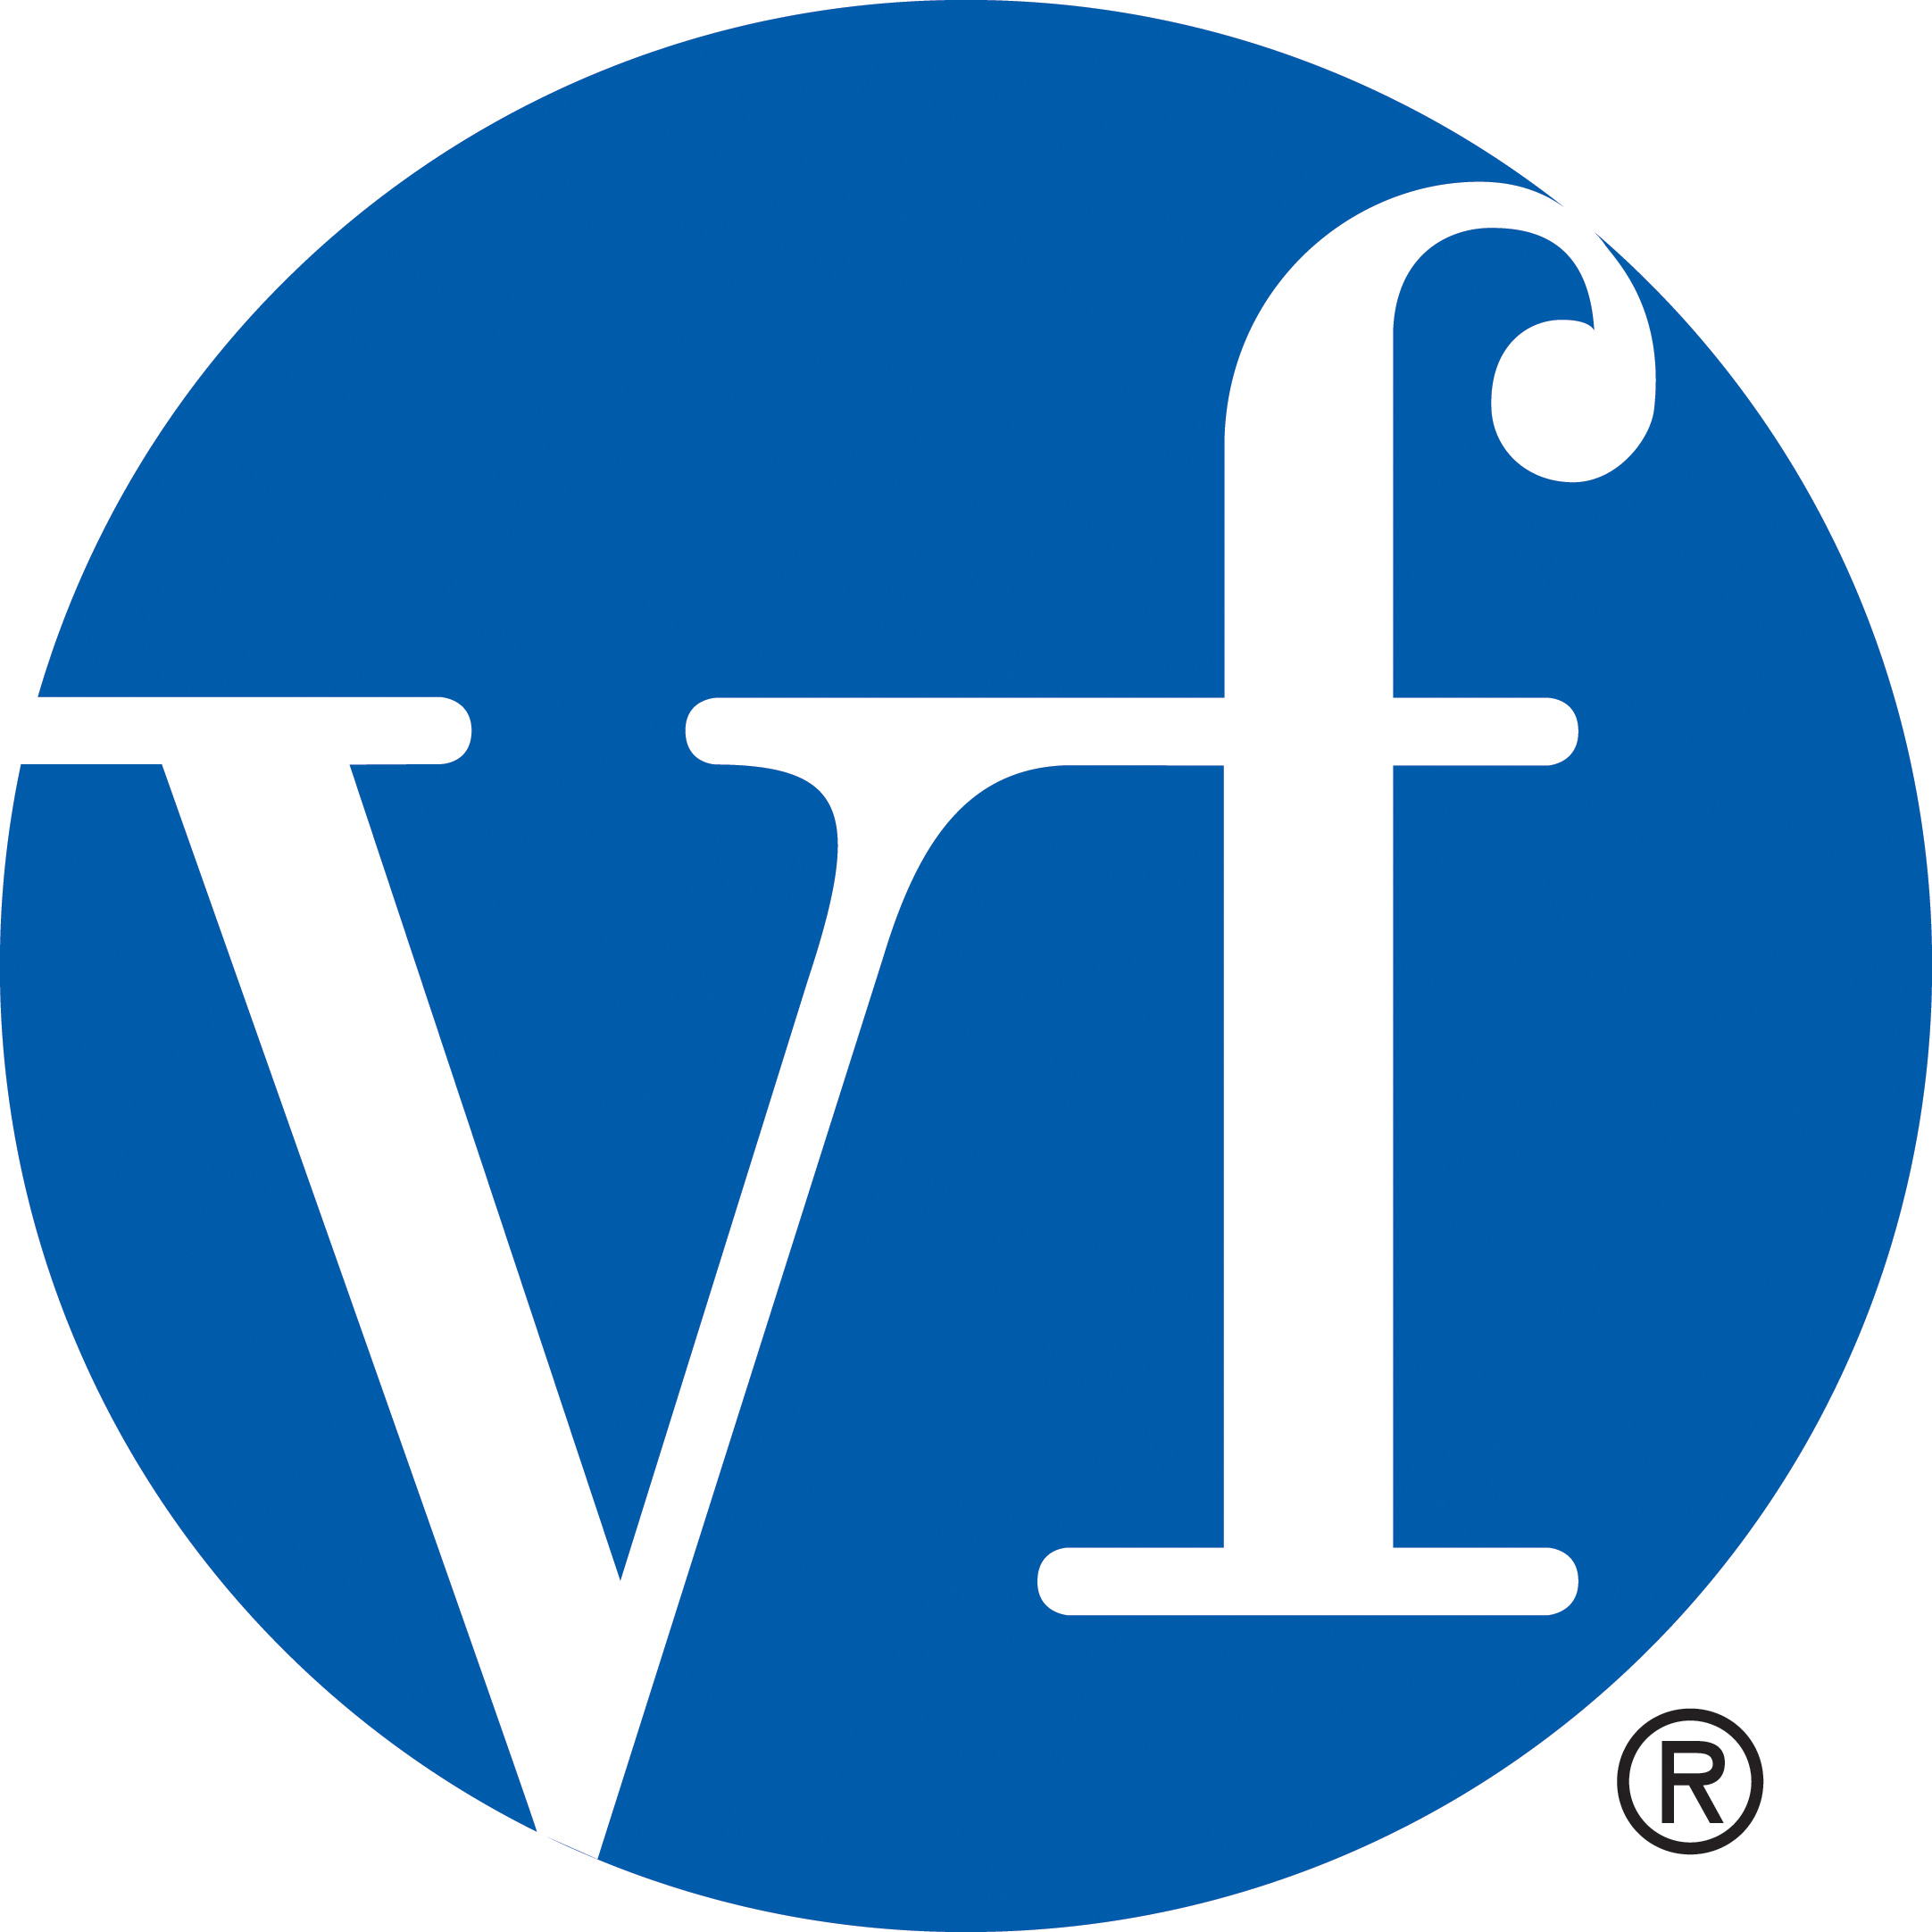 Vfc forex